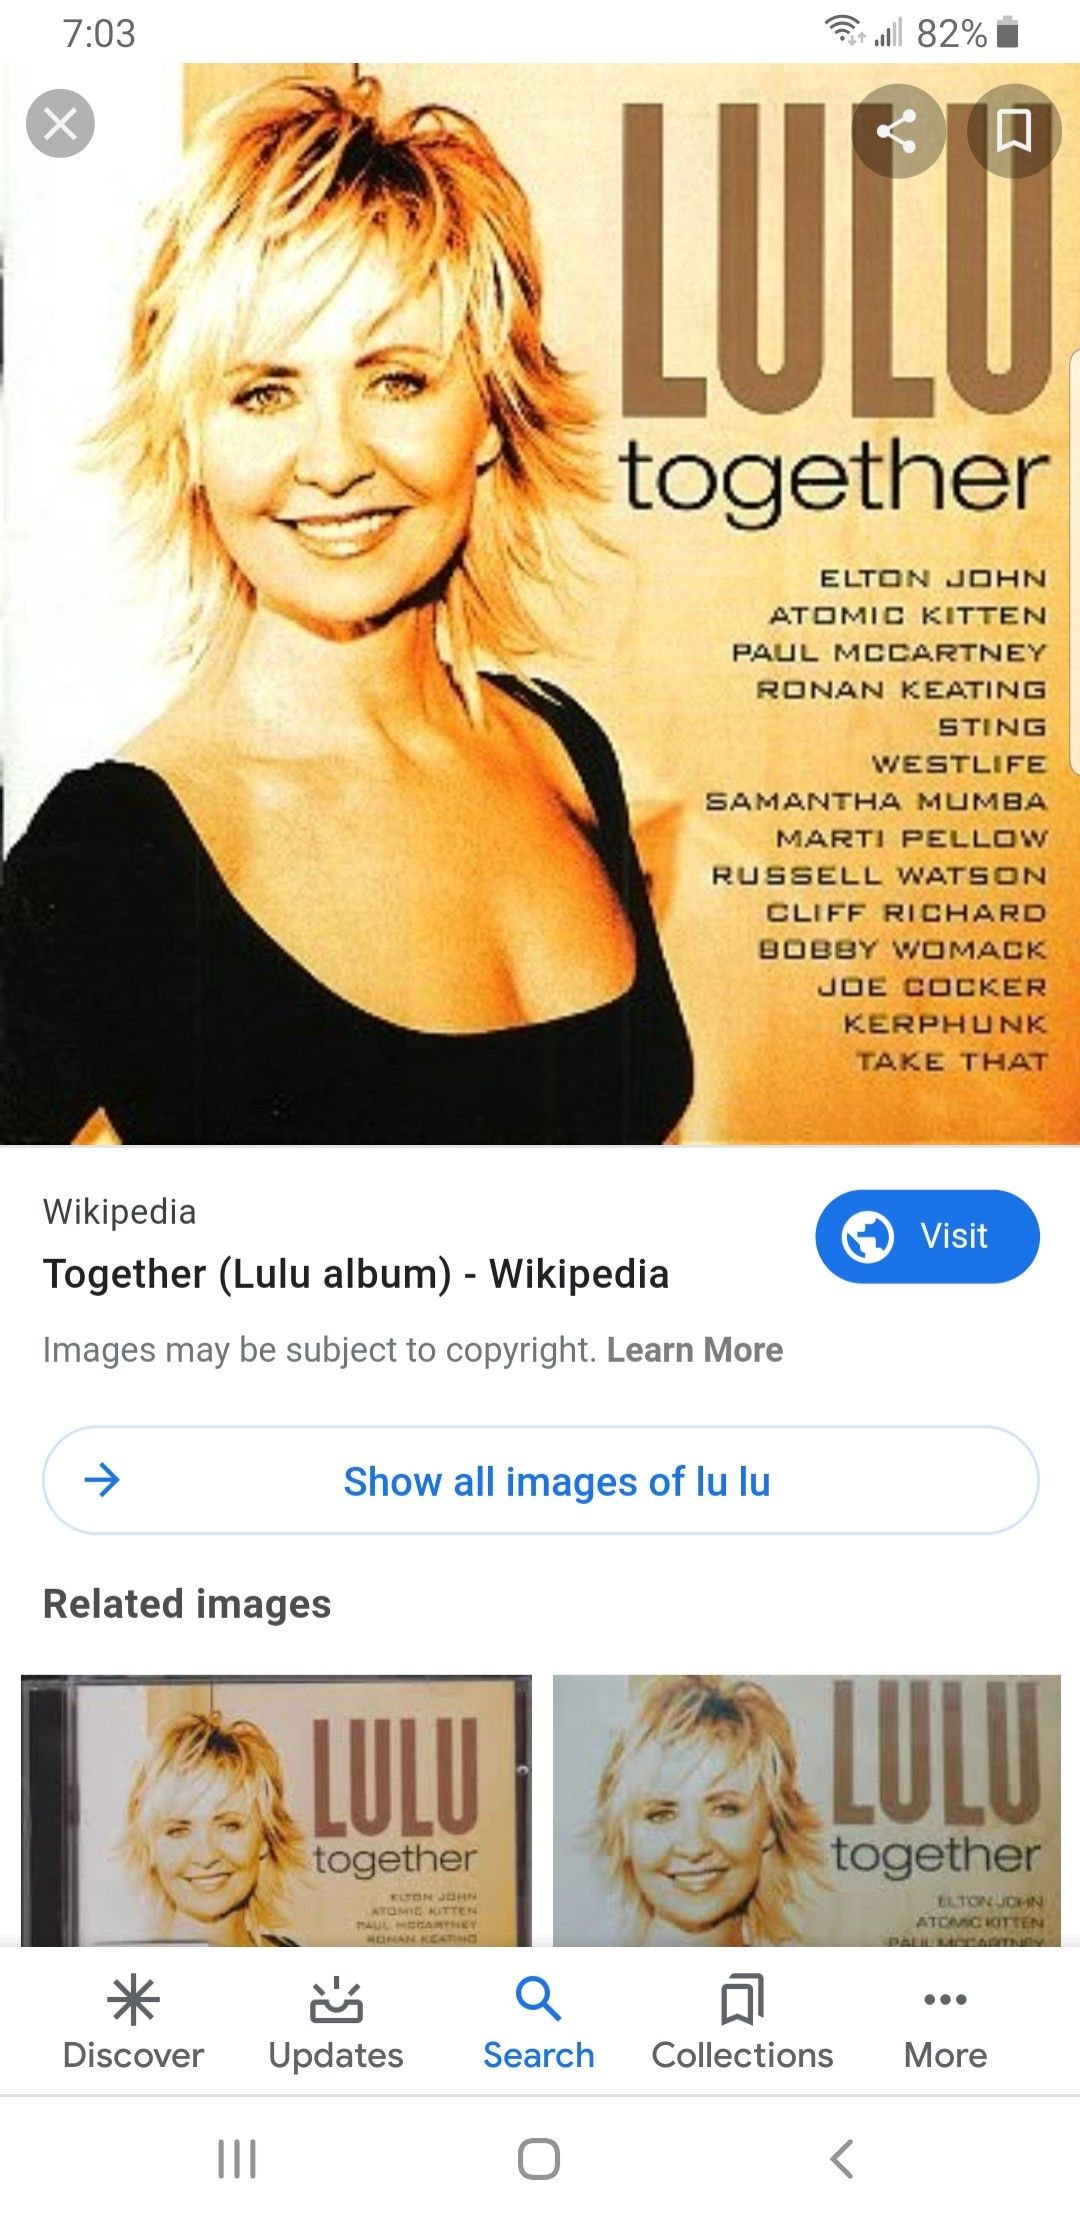 Pin By Yolanda Delgado Fowler On Hair Styles In 2020 Paul Mccartney Elton John Atomic Kitten